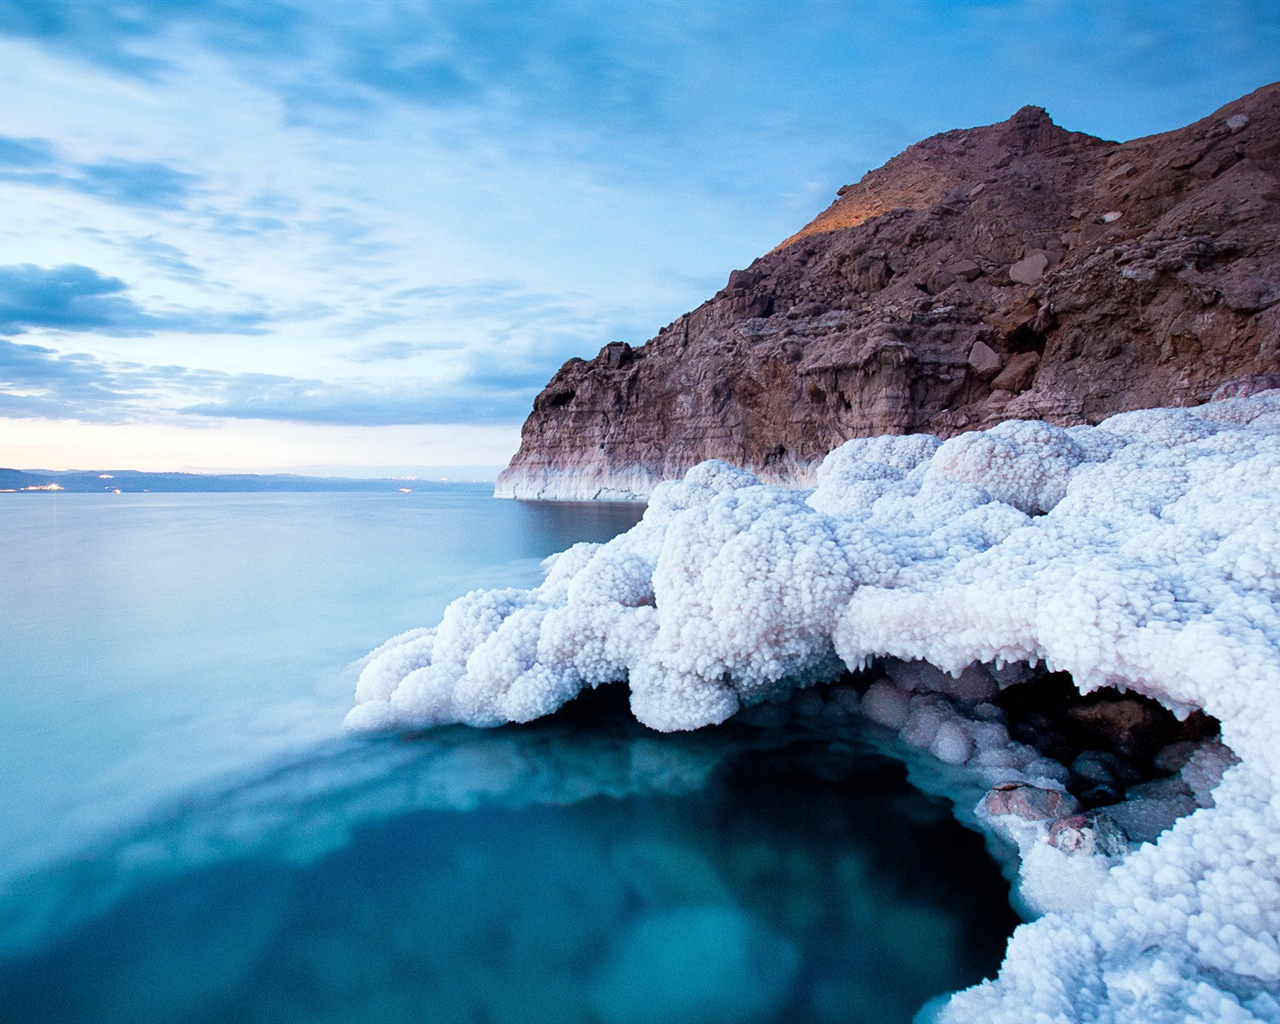 Dead Sea Paysages Magnifiques Fonds D Ecran Hd 13 1280x1024 Fond D Ecran Telecharger Dead Sea Paysages Magnifiques Fonds D Ecran Hd Paysage Fond D Ecran V3 Fond D Ecran Du Site